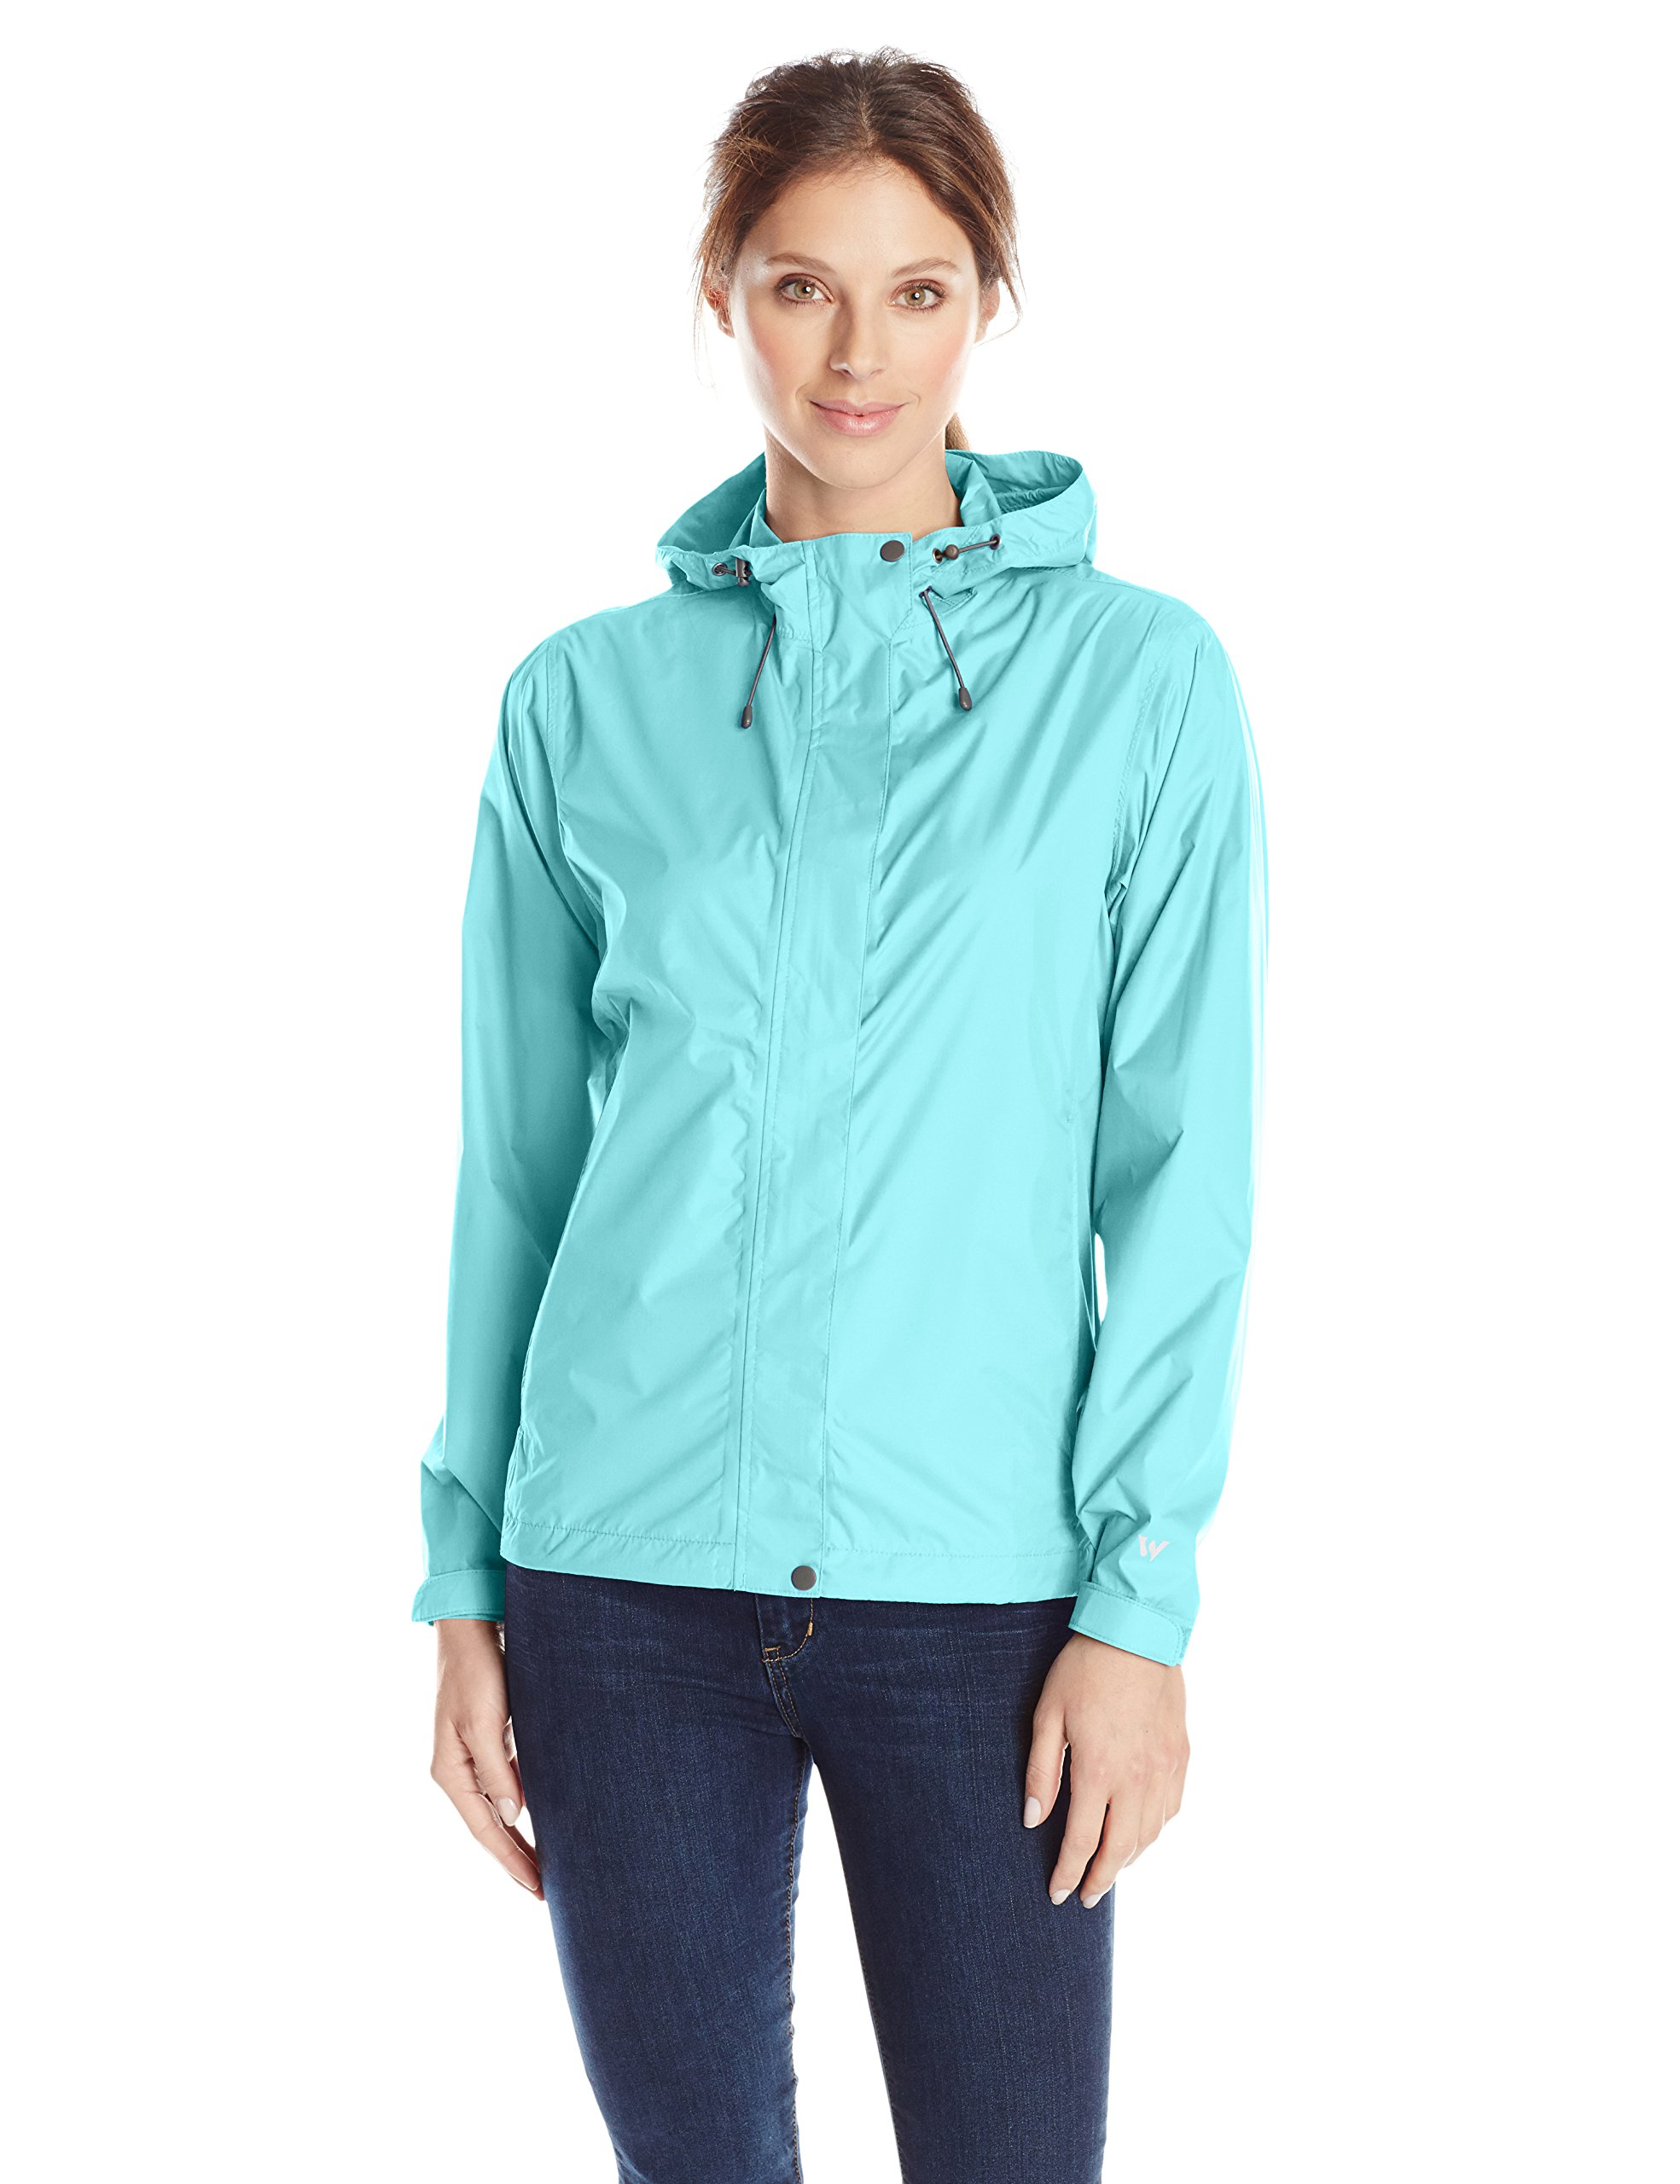 White Sierra Women's Trabagon Rain Shell, Blue Radiance, Large